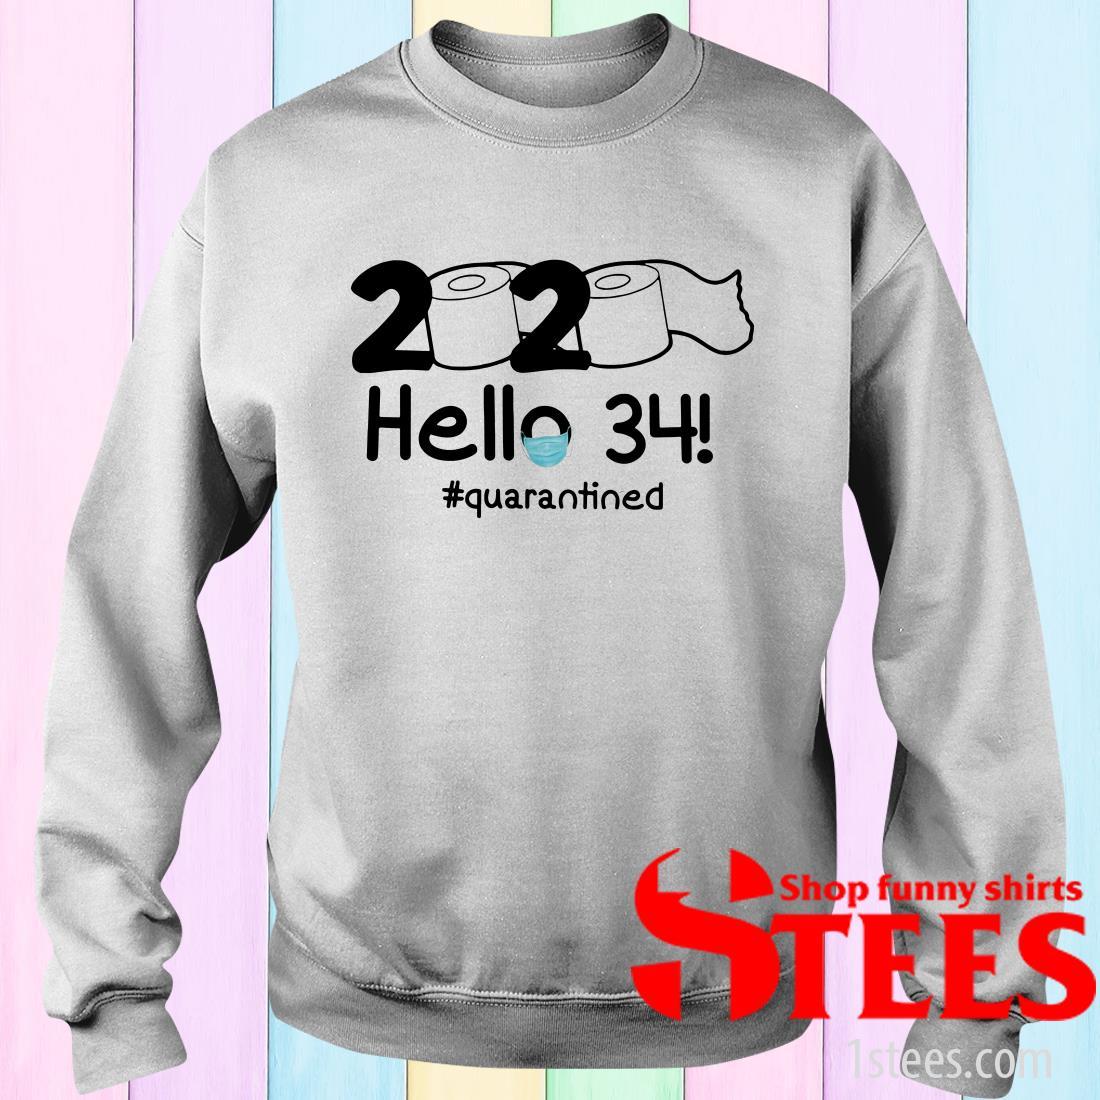 2020 Hello 34 #Quarantined Shirt